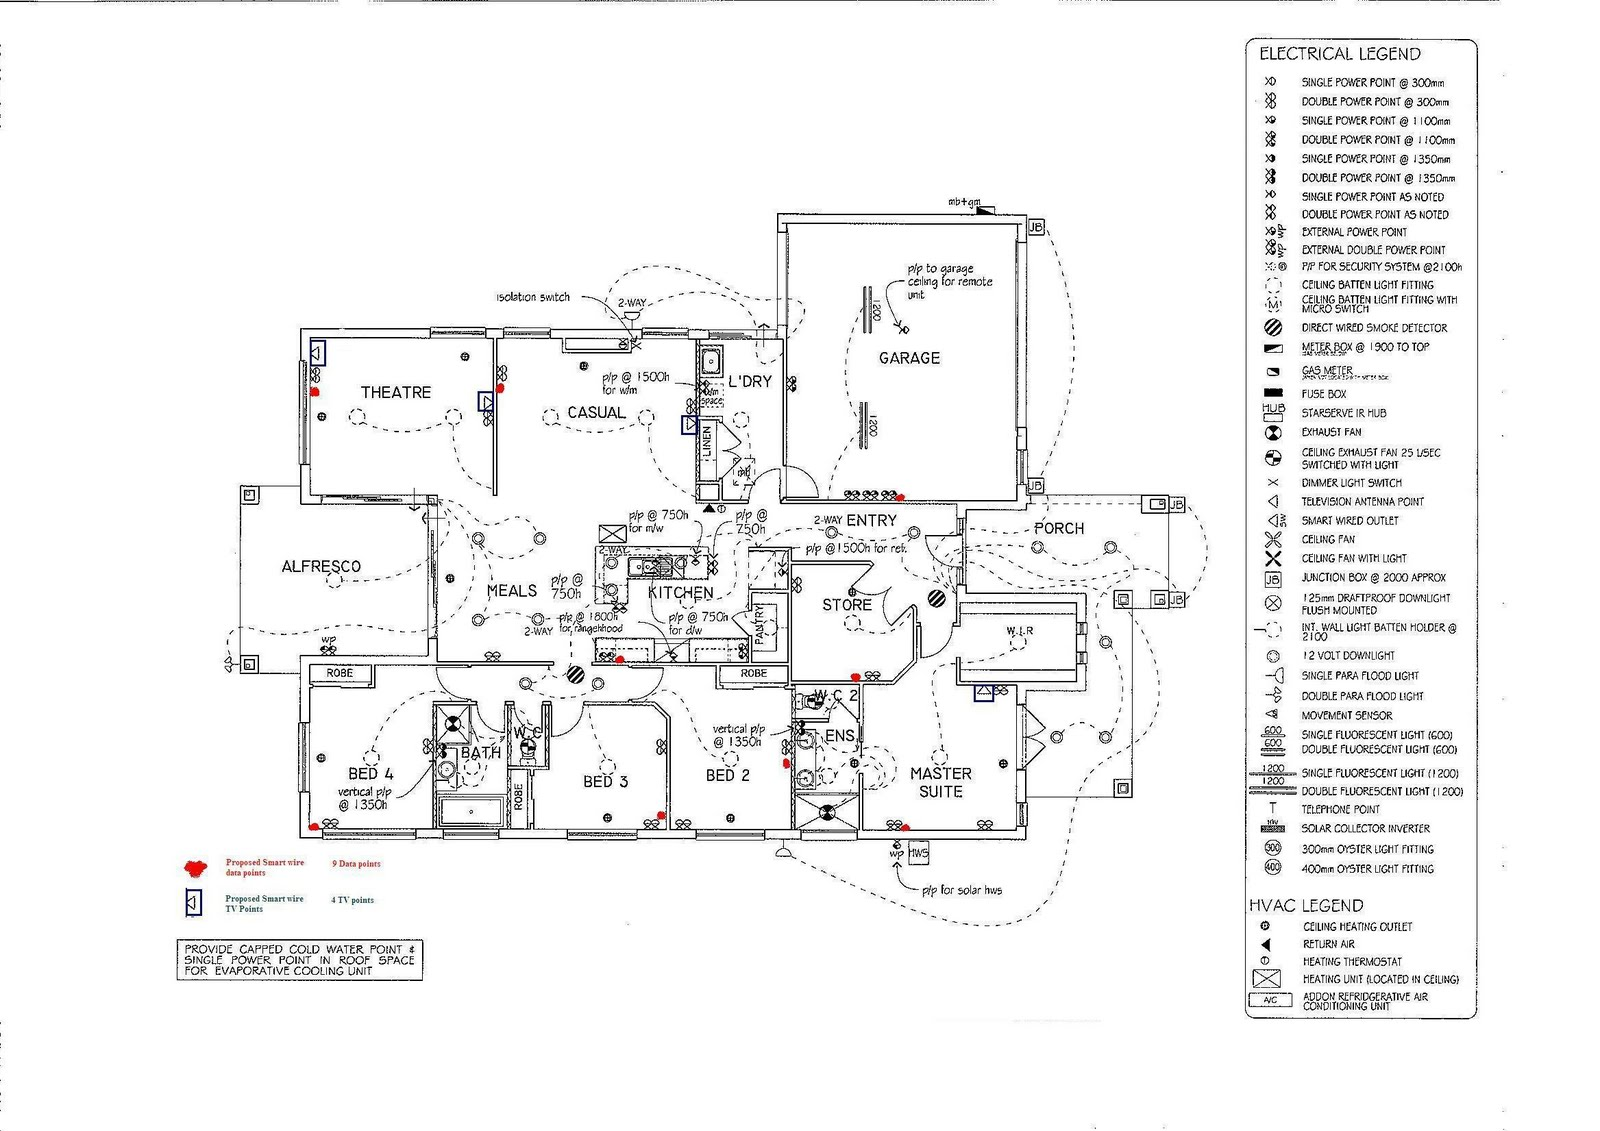 Electrical Wiring House Plans - Merzie.net